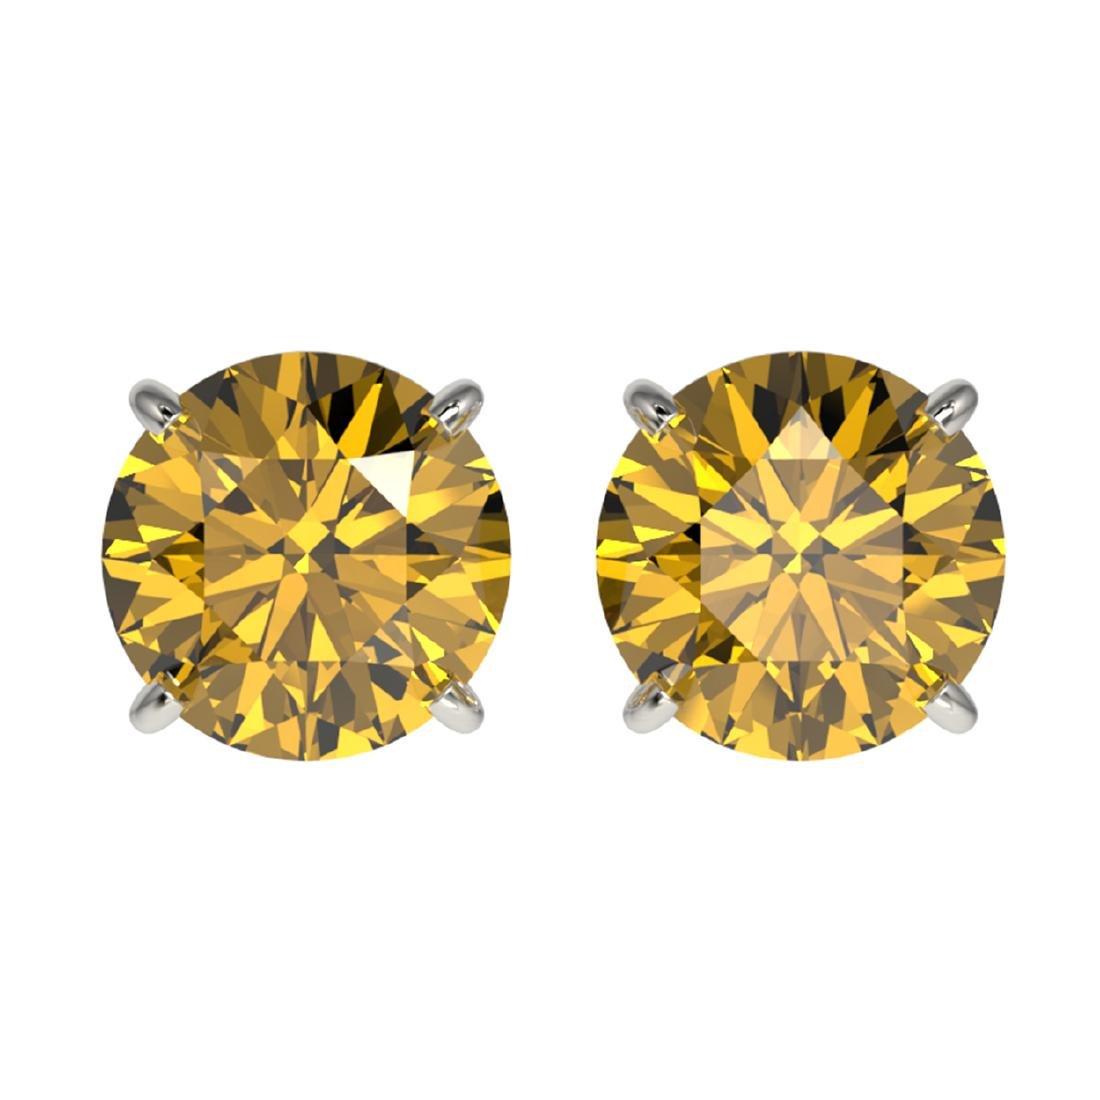 2.04 ctw Intense Yellow Diamond Stud Earrings 10K White